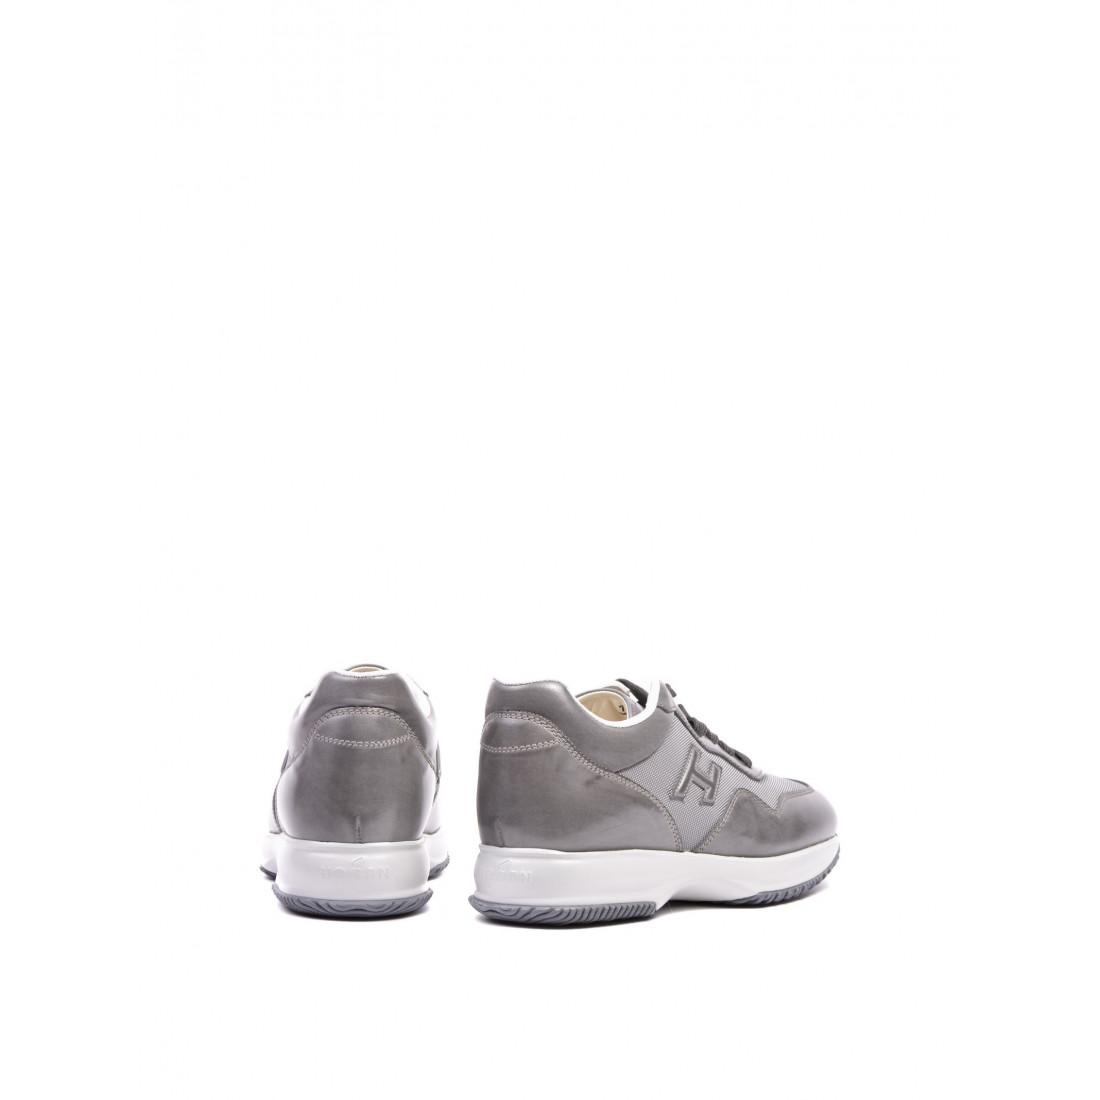 sneakers uomo hogan hxm00n0u0405zf4633